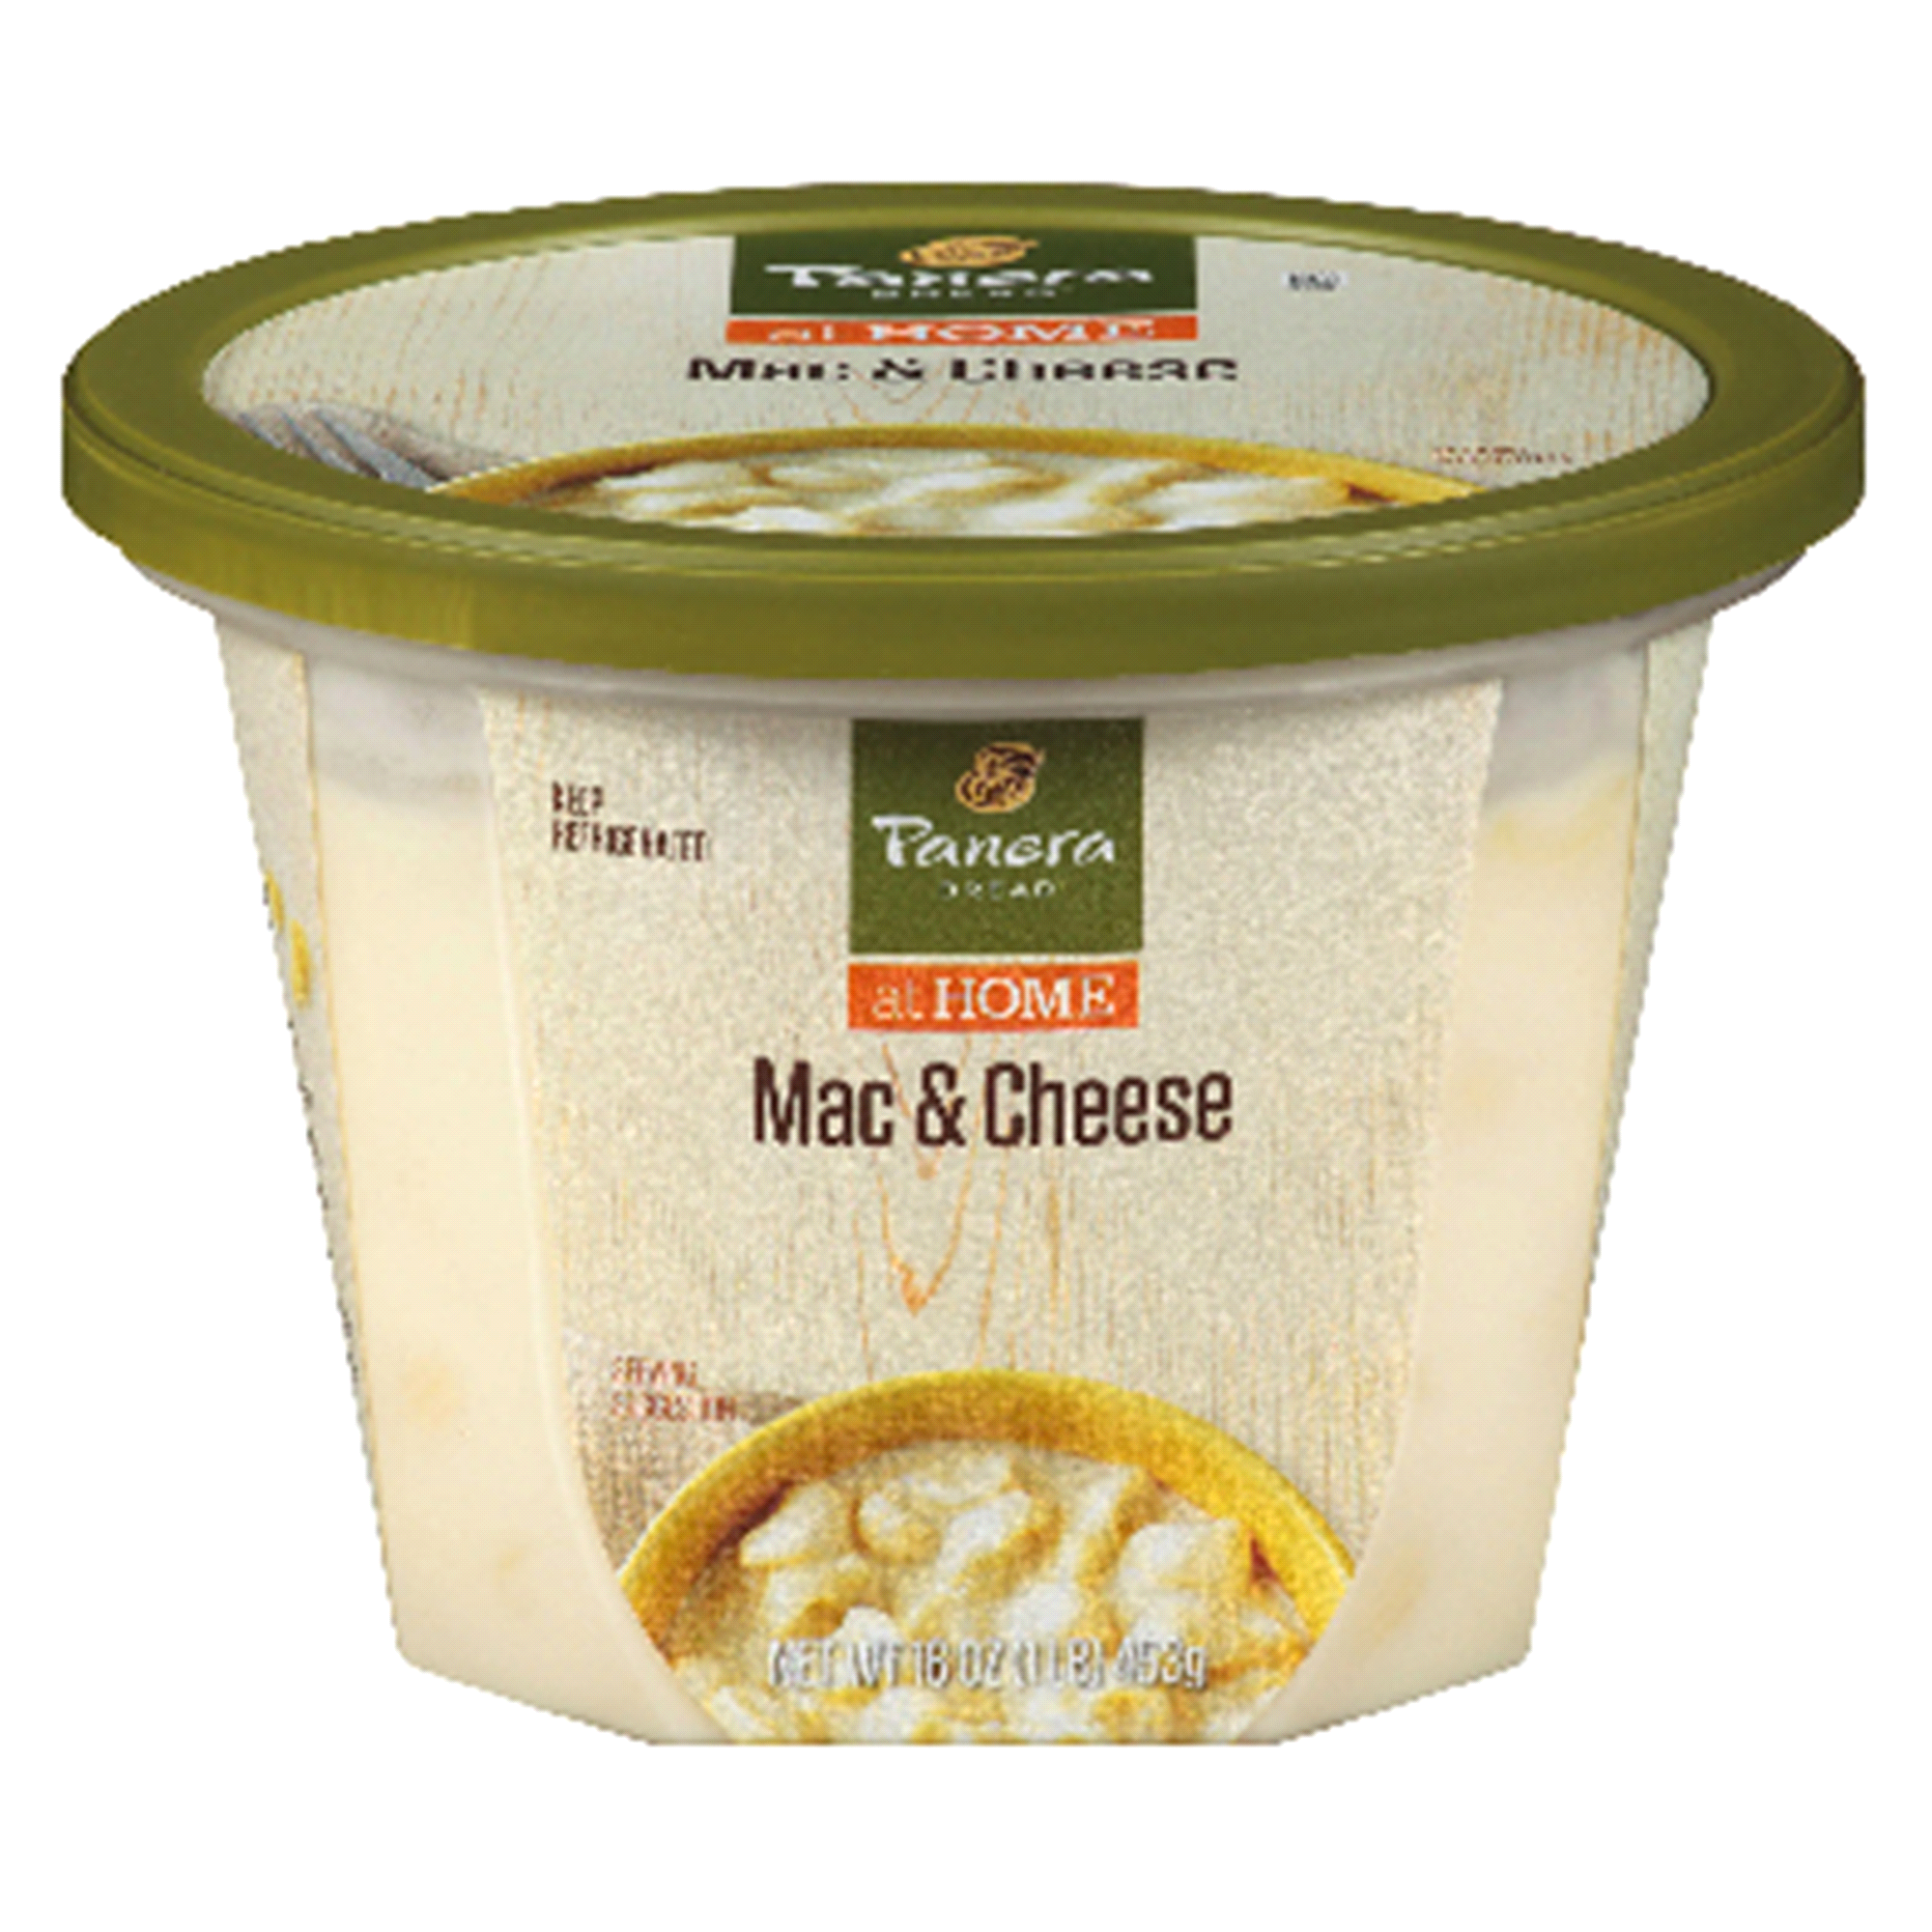 Panera Bread Mac & Cheese 16 oz | Meijer.com